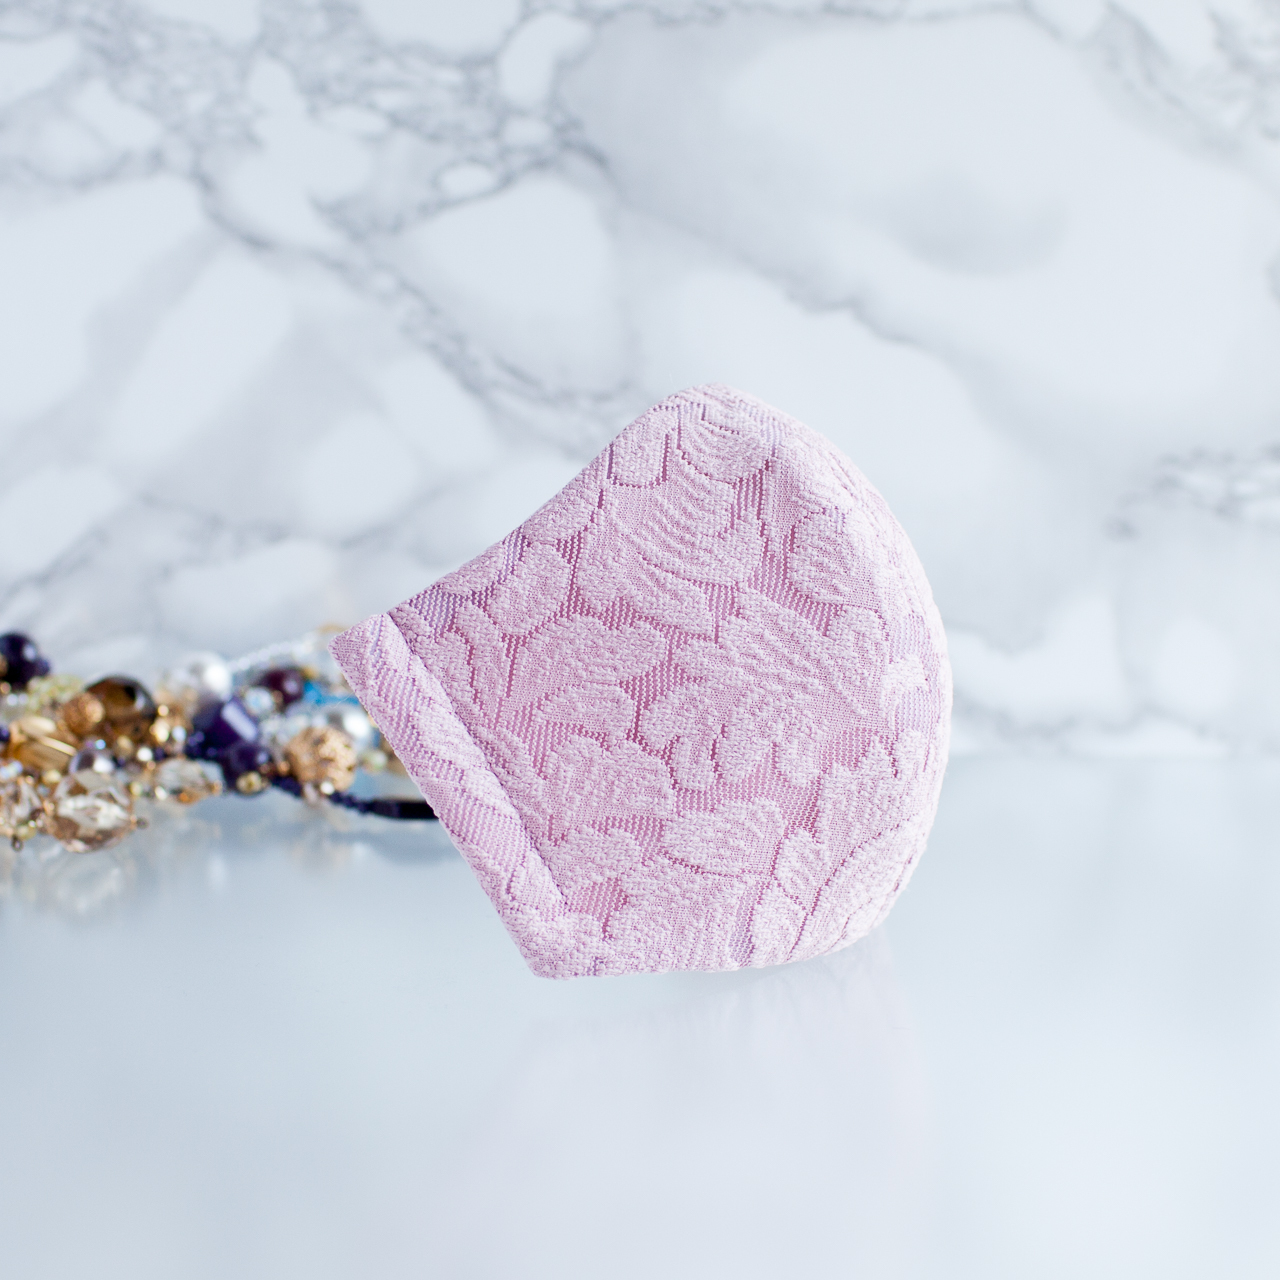 PSNY 送料無料 フレキシブル・ニット・ピンク レース 花粉 黄砂 不織布フィルター入り 立体 大人 おとな 近江ちぢみ 美人 結婚式 高級 柔らかい ソフト 上品 ますく 美しい マスク LK34